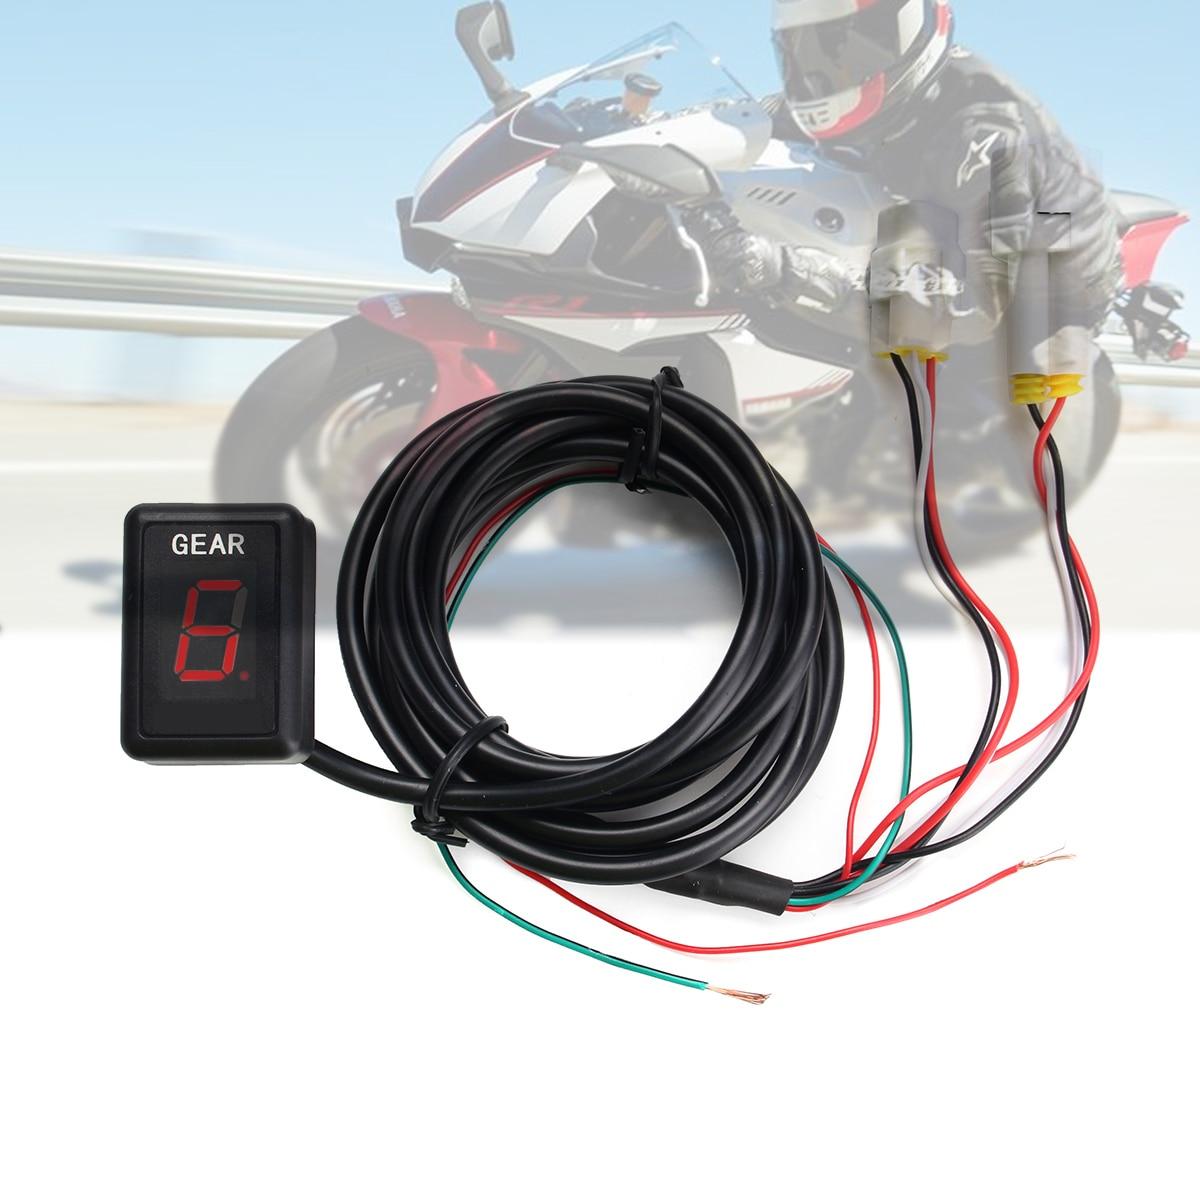 купить Motorcycle 1-6 Speed Gear Indicator Gear Meter Red LED Display for Yamaha YZF-R1 YZF-R6 Xt660 Fz6 Fz-16 Fz1 Fz8 онлайн